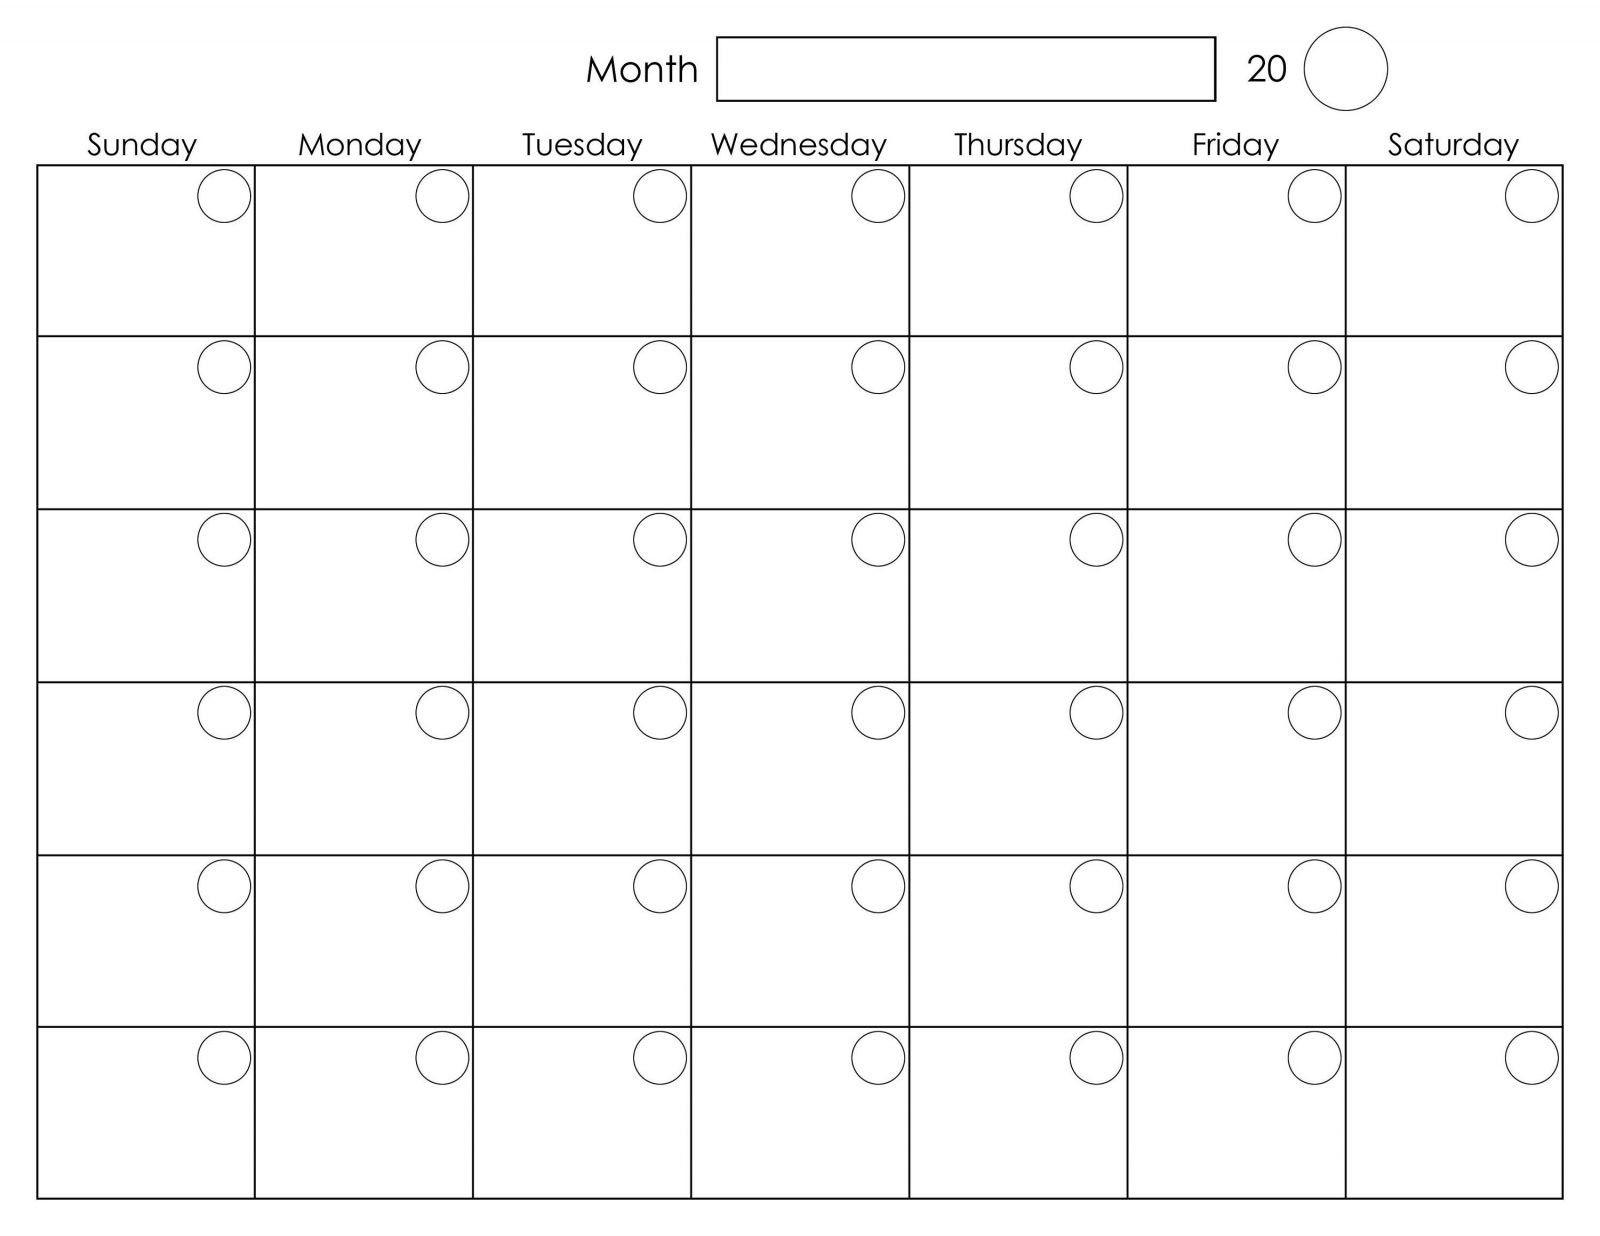 Monday To Friday Weekly Calendar | Ten Free Printable